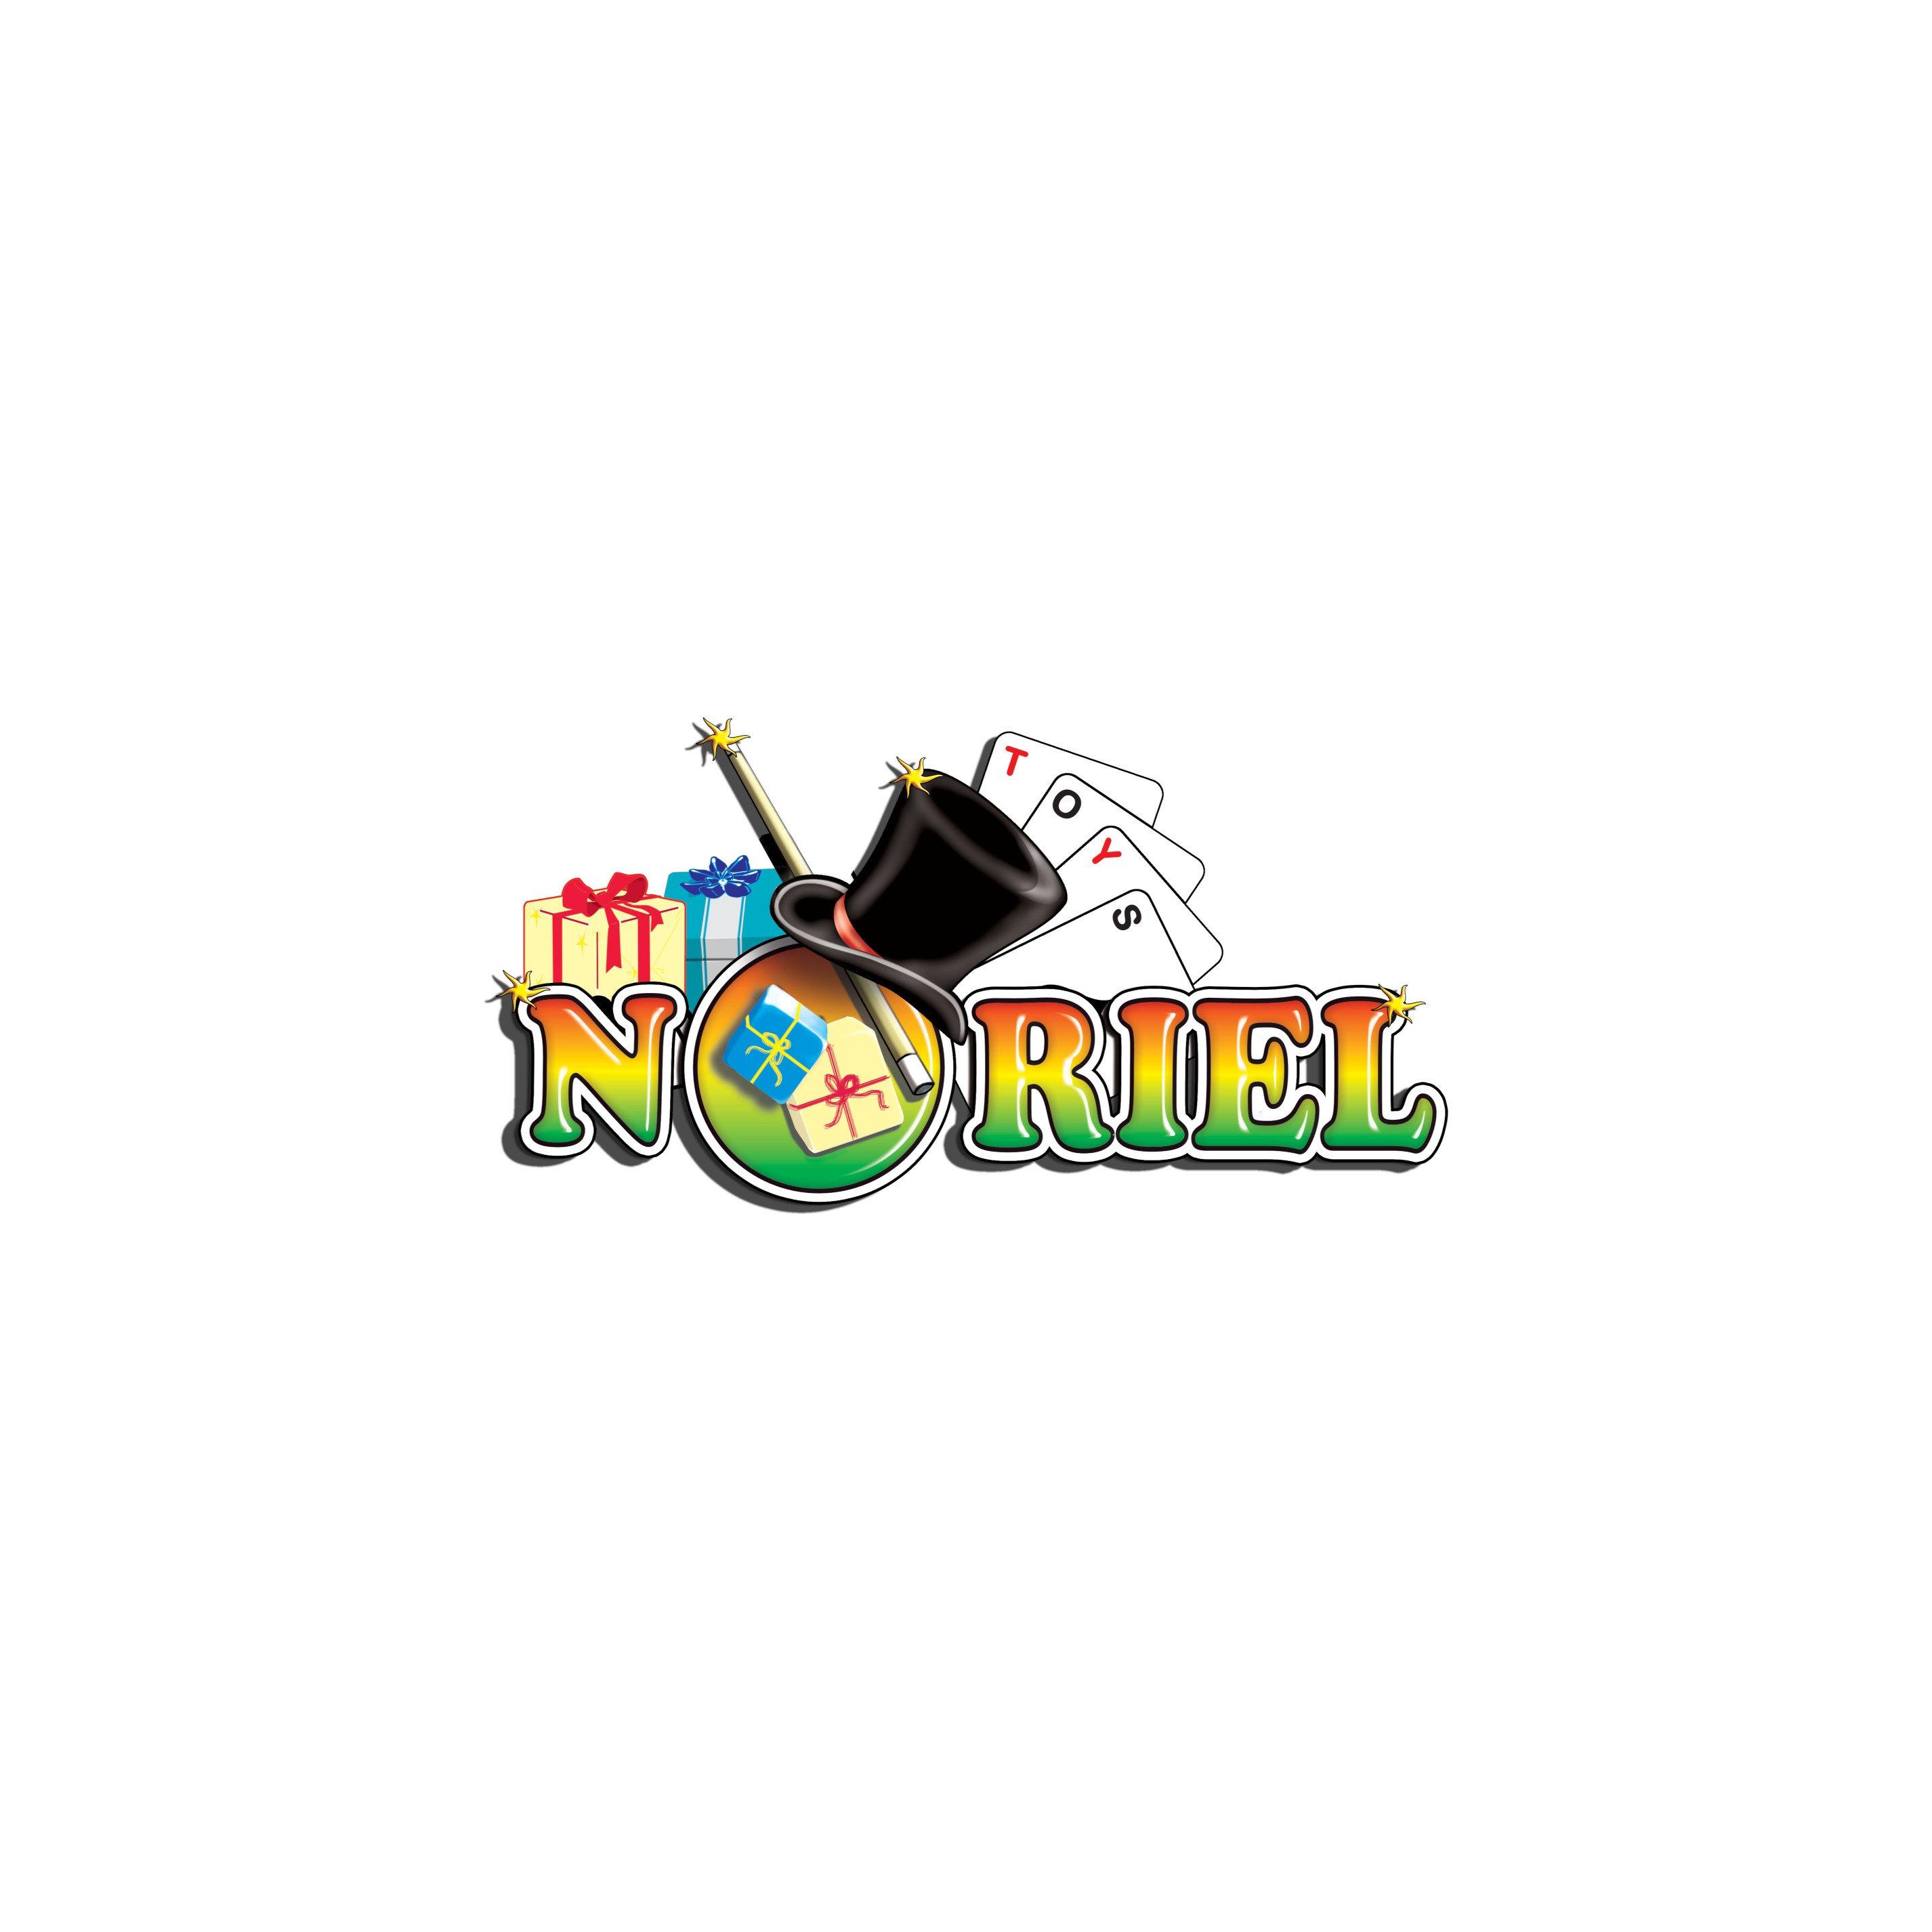 Masina cu telecomanda Maisto Rock Crawler Junior, Portocaliu 81162